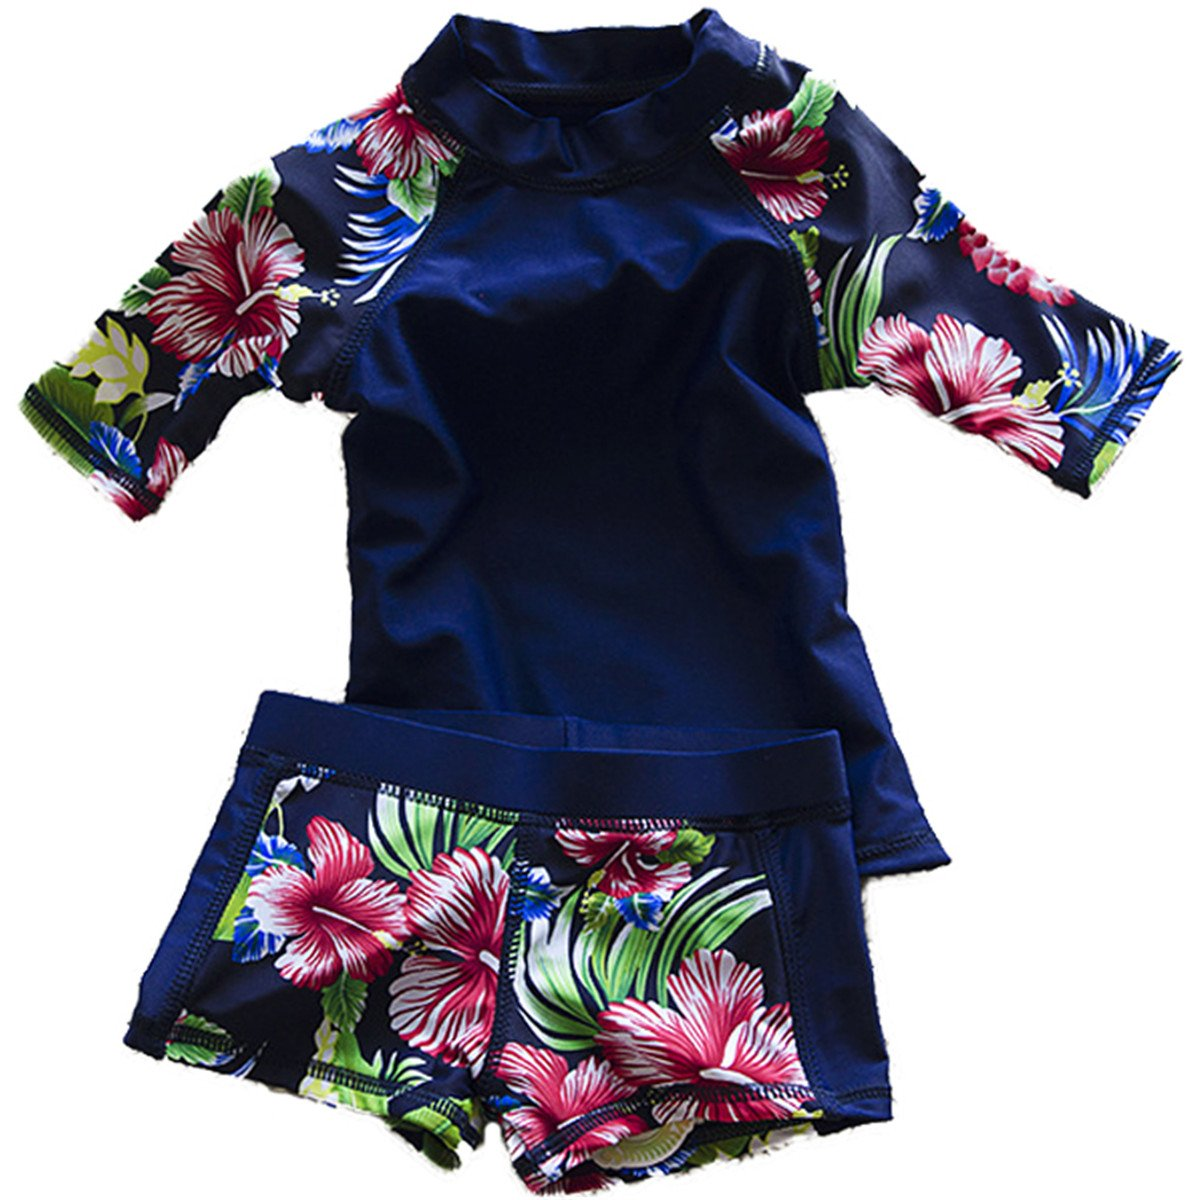 Baby Girls Kids Toddler Two Piece Round-Neck Rash Guard UV Sun Protection Swimsuit swimboygi0193